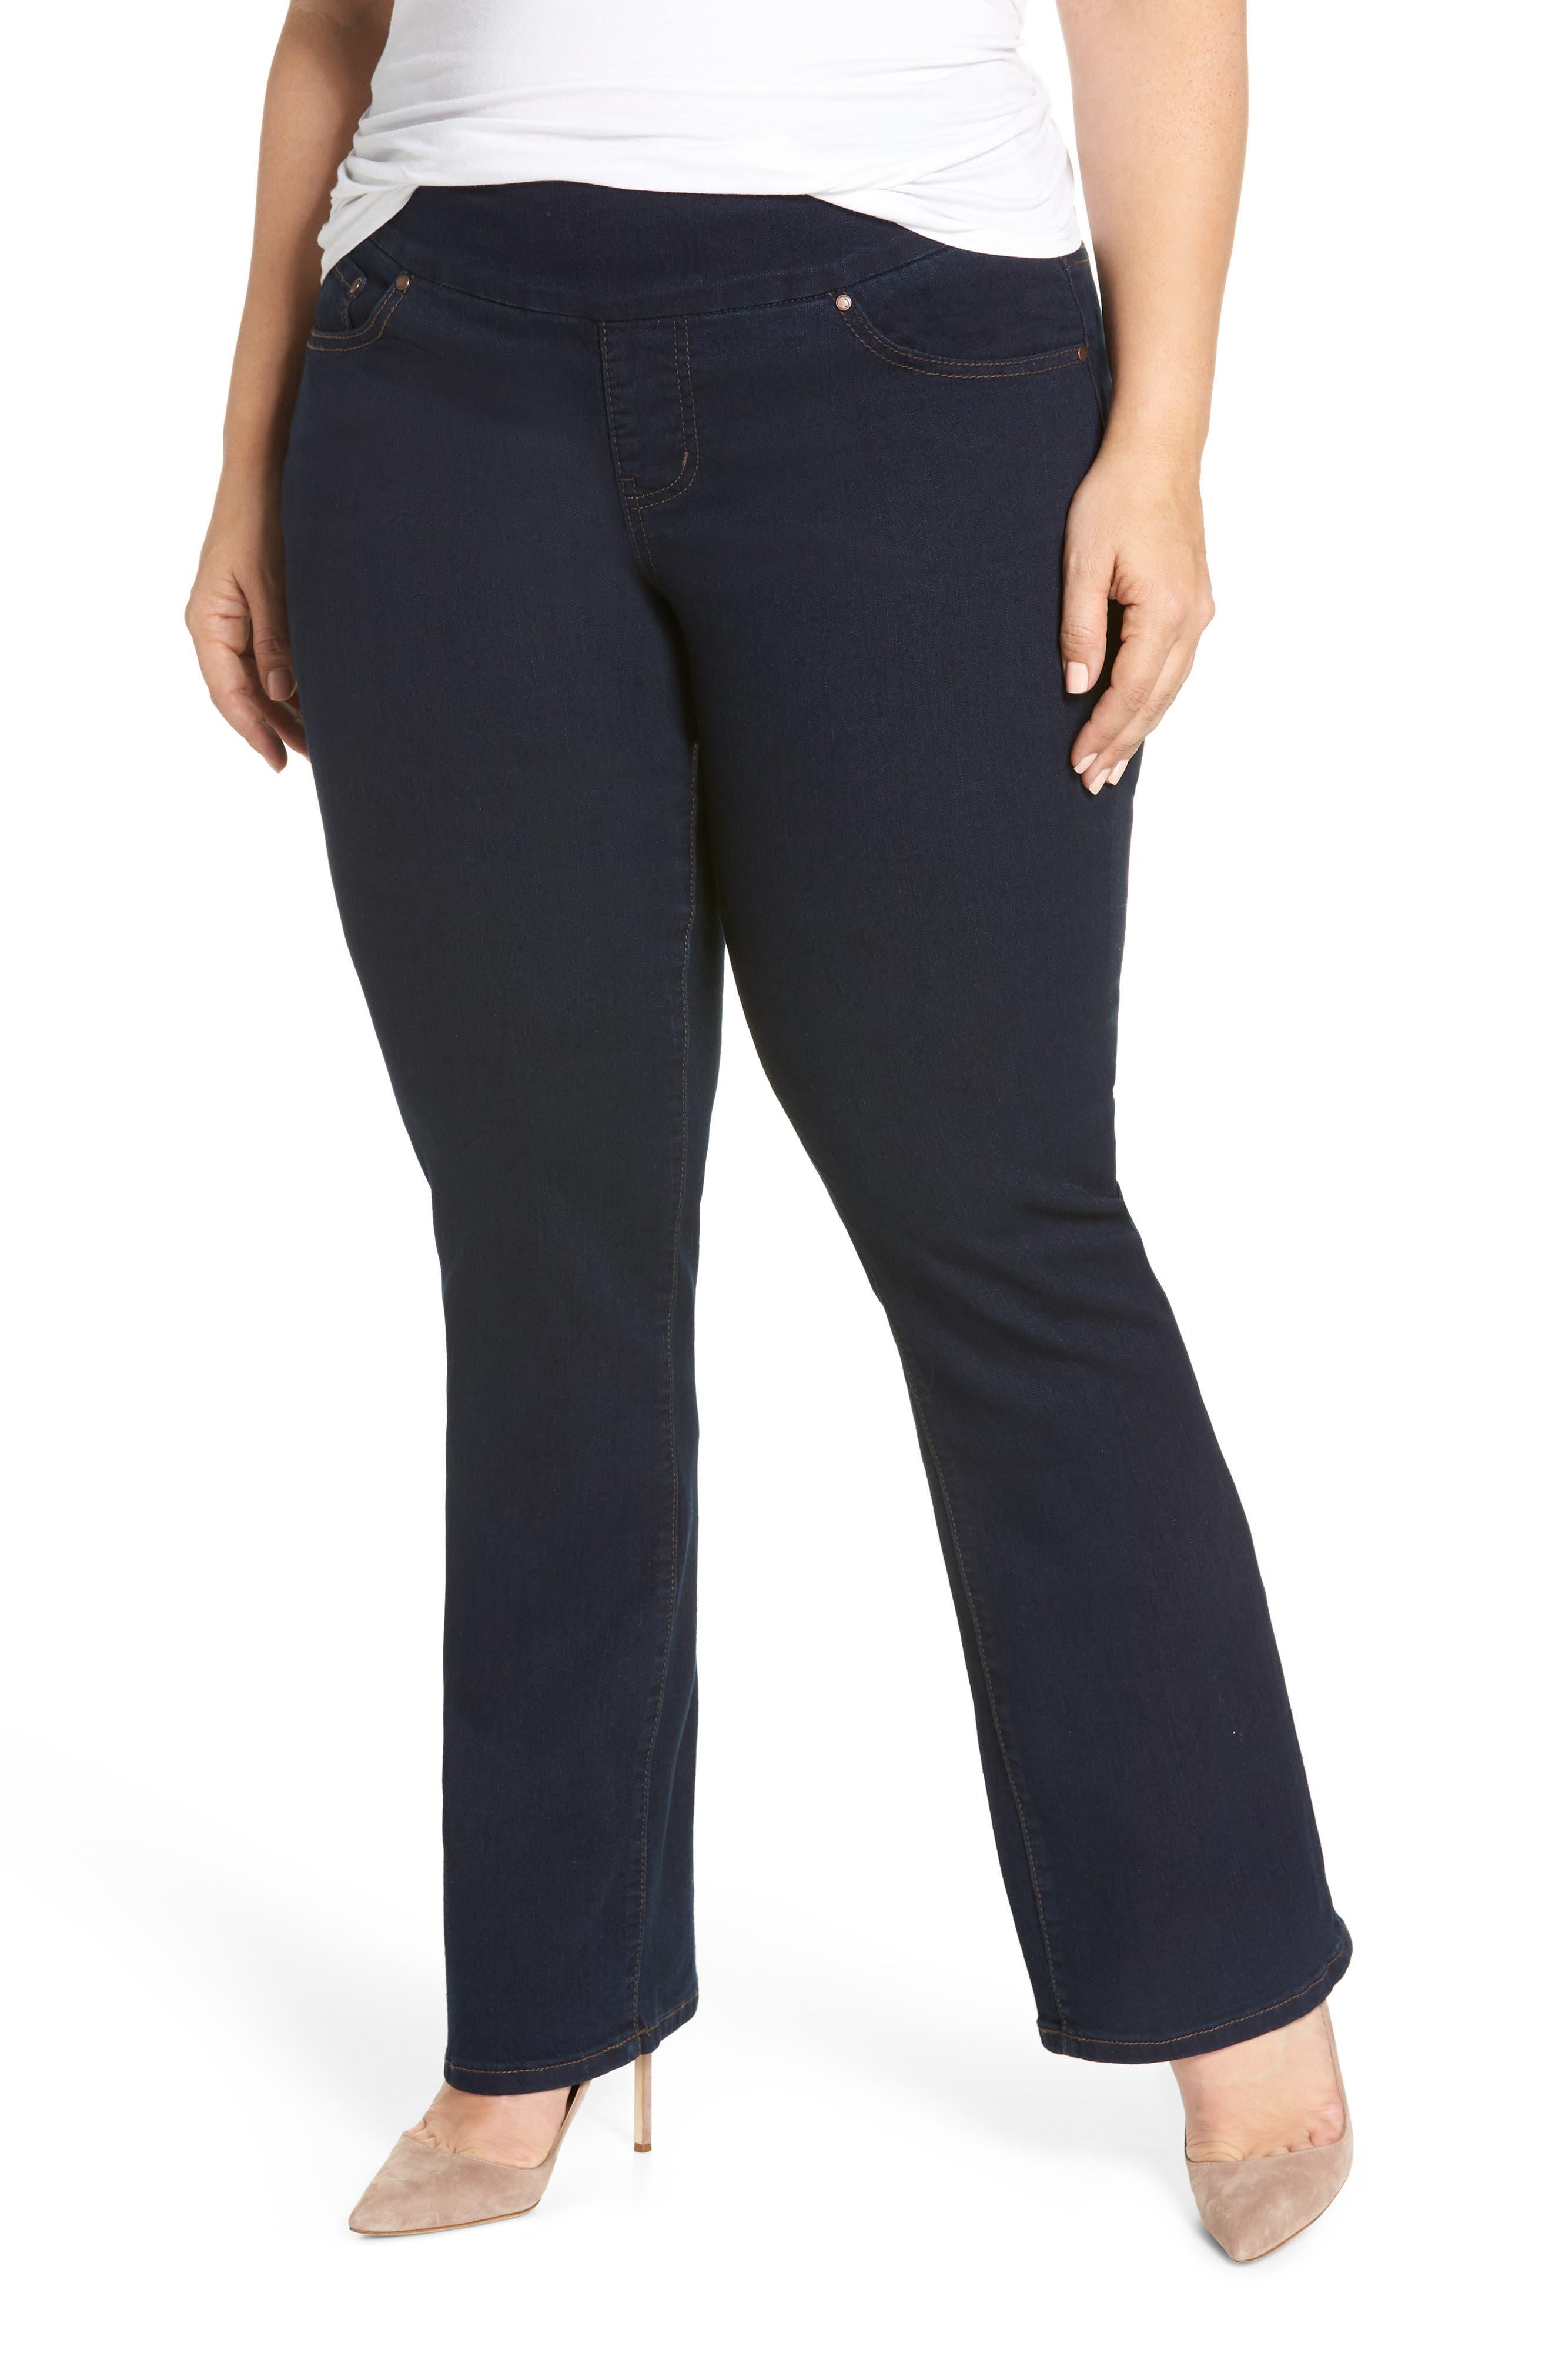 Peri Stretch Straight Leg Jeans,                             Main thumbnail 1, color,                             DARK INDIGO